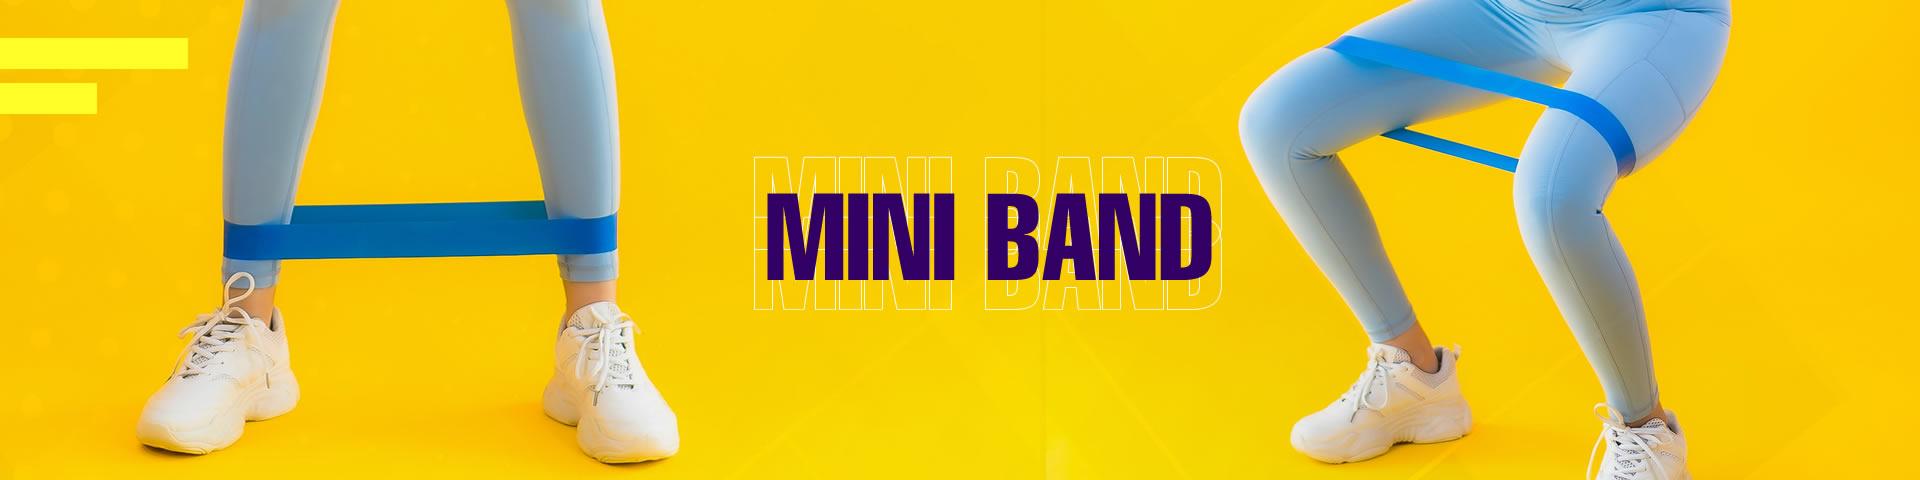 miniband2